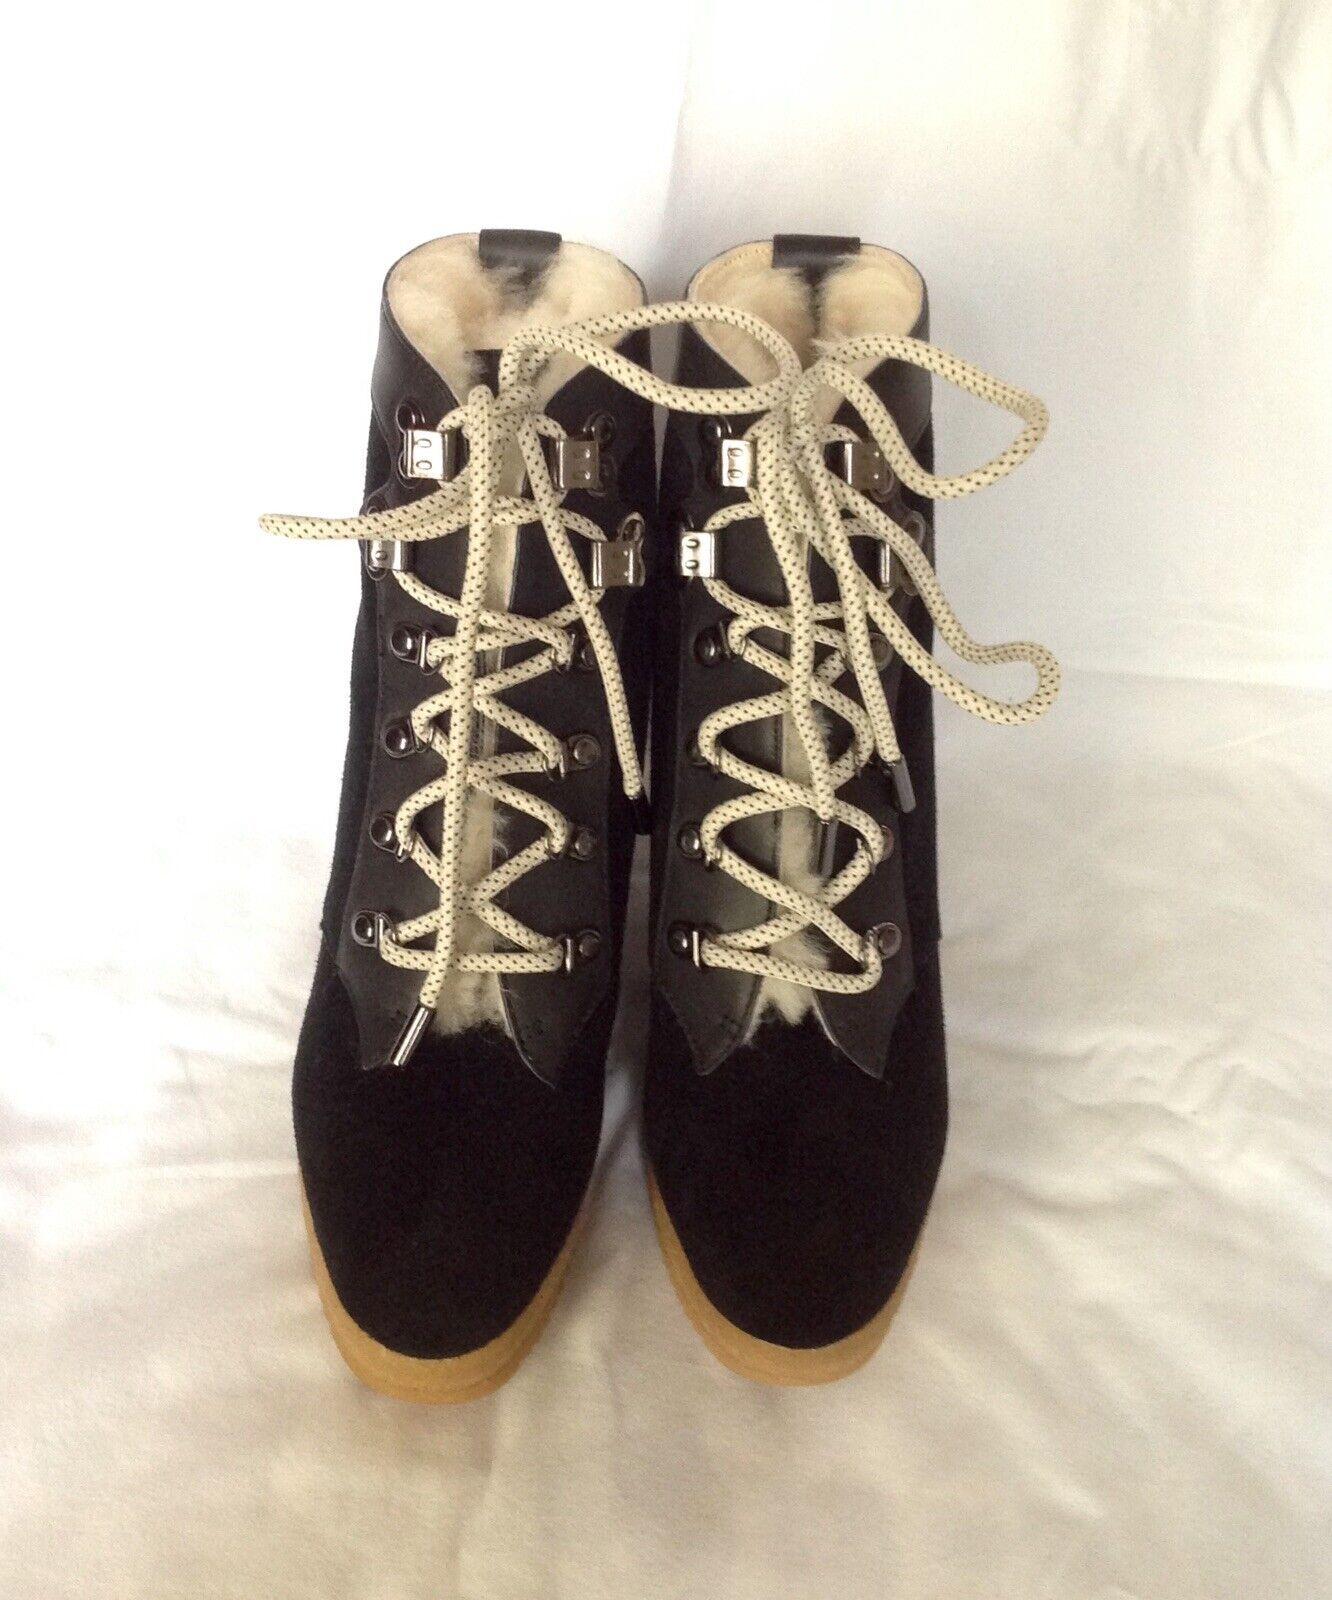 5073ae48 Joie cuña de plataforma Laceup botas al tobillo en gamuza cuero negro,  tamaño 37 nazktt1616-Botas